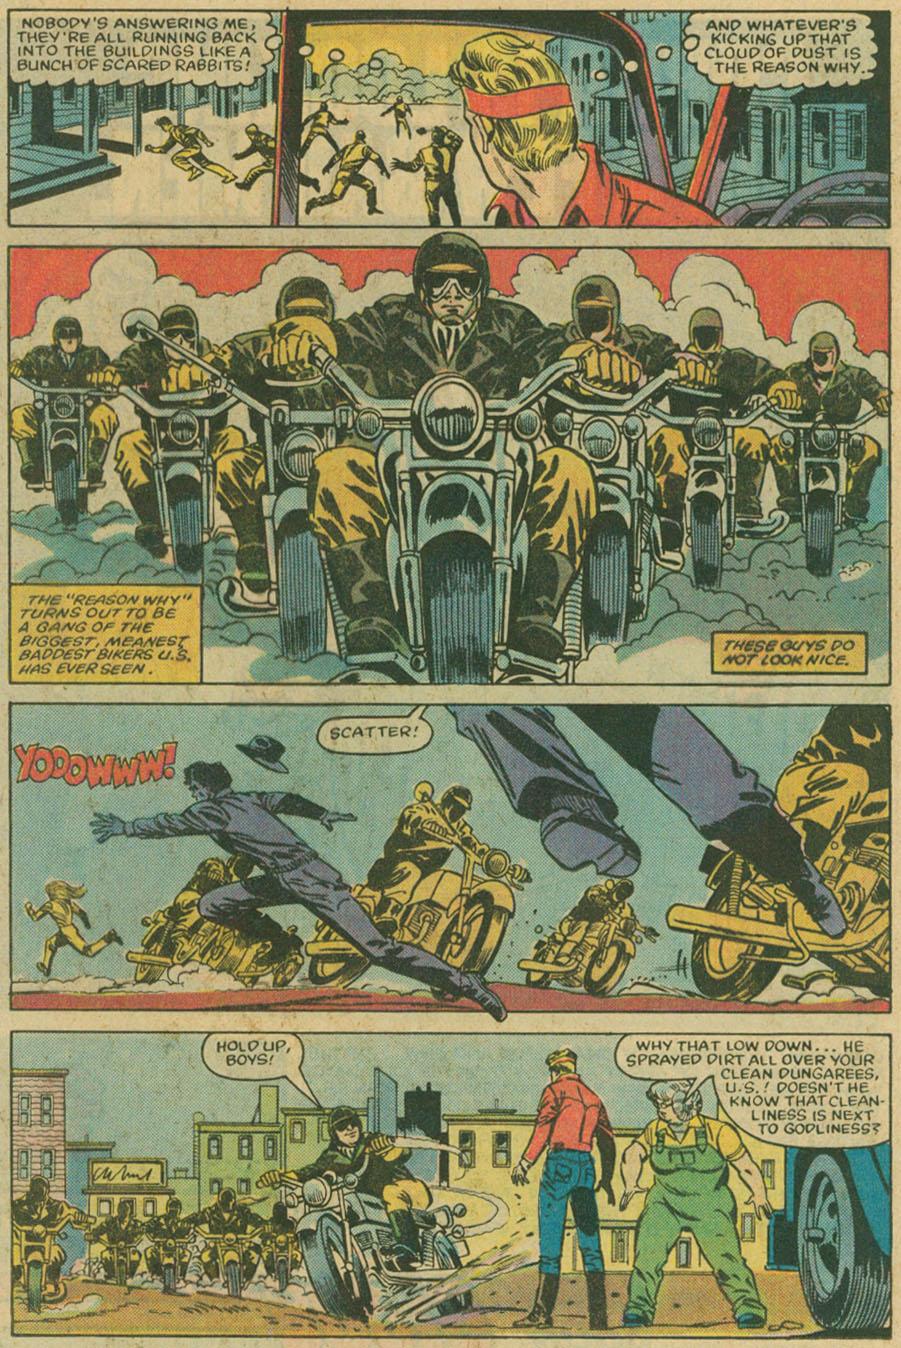 Read online U.S. 1 comic -  Issue #6 - 14